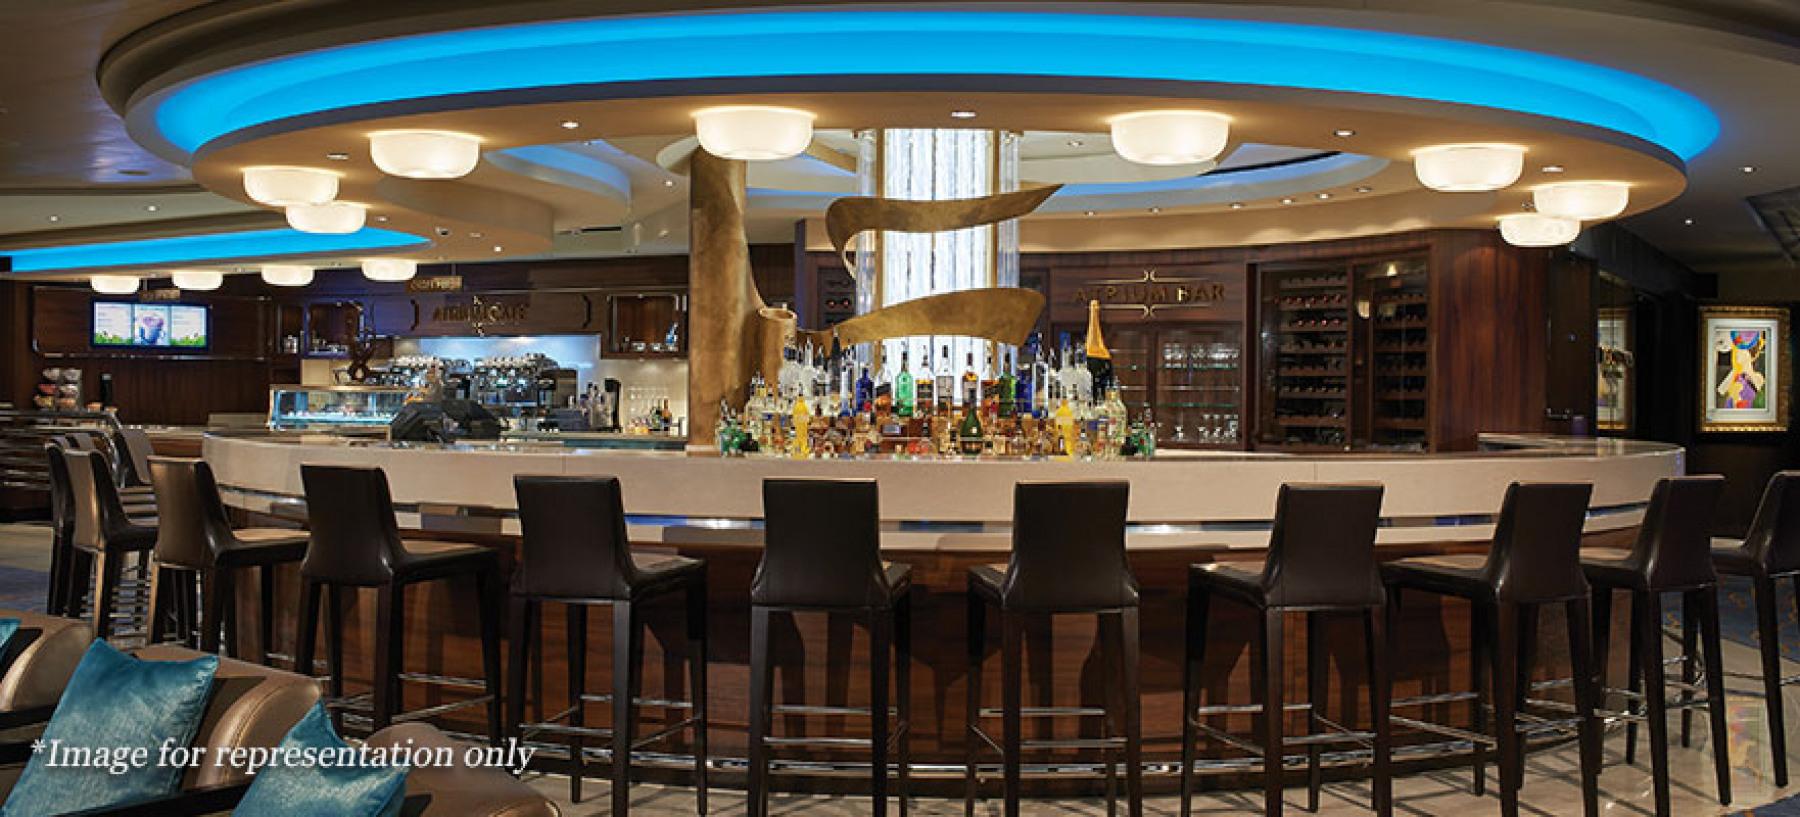 Norwegian Cruise Lines Norwegian Joy Interior Atrium Cafe and Bar.jpg